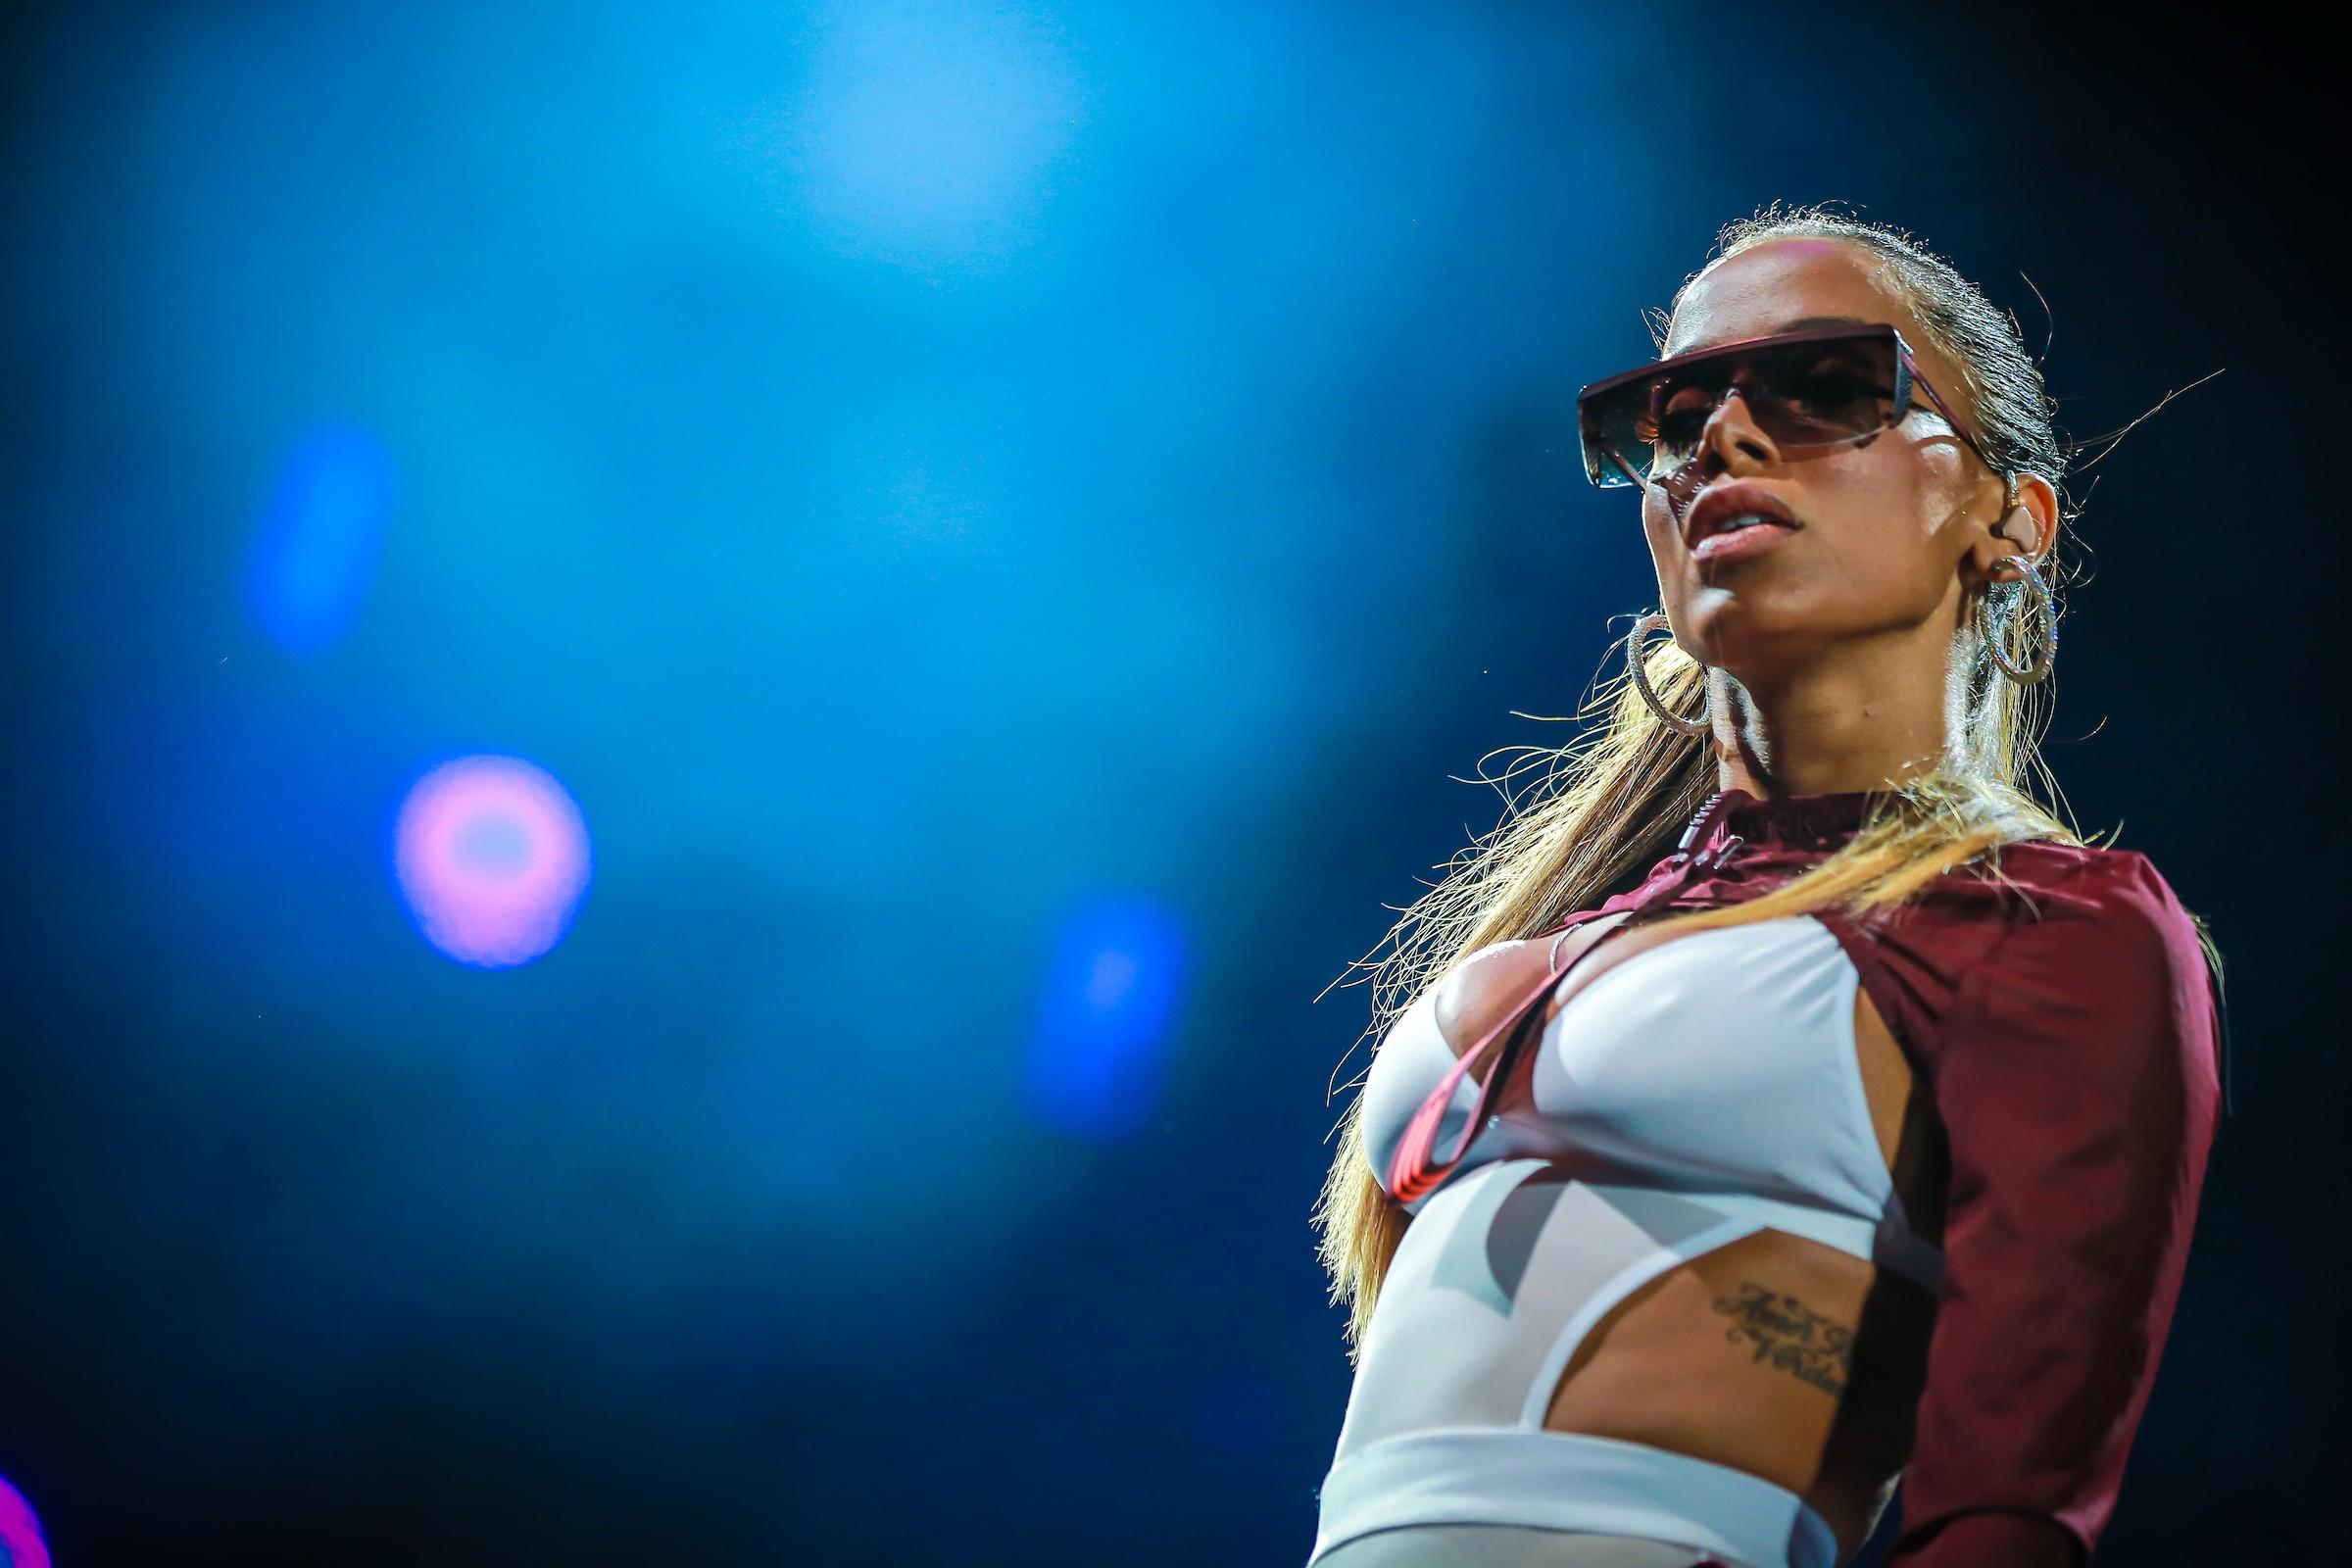 'Short 'tipo Anitta' significa que ela é independente', diz cantora após ser citada por motorista